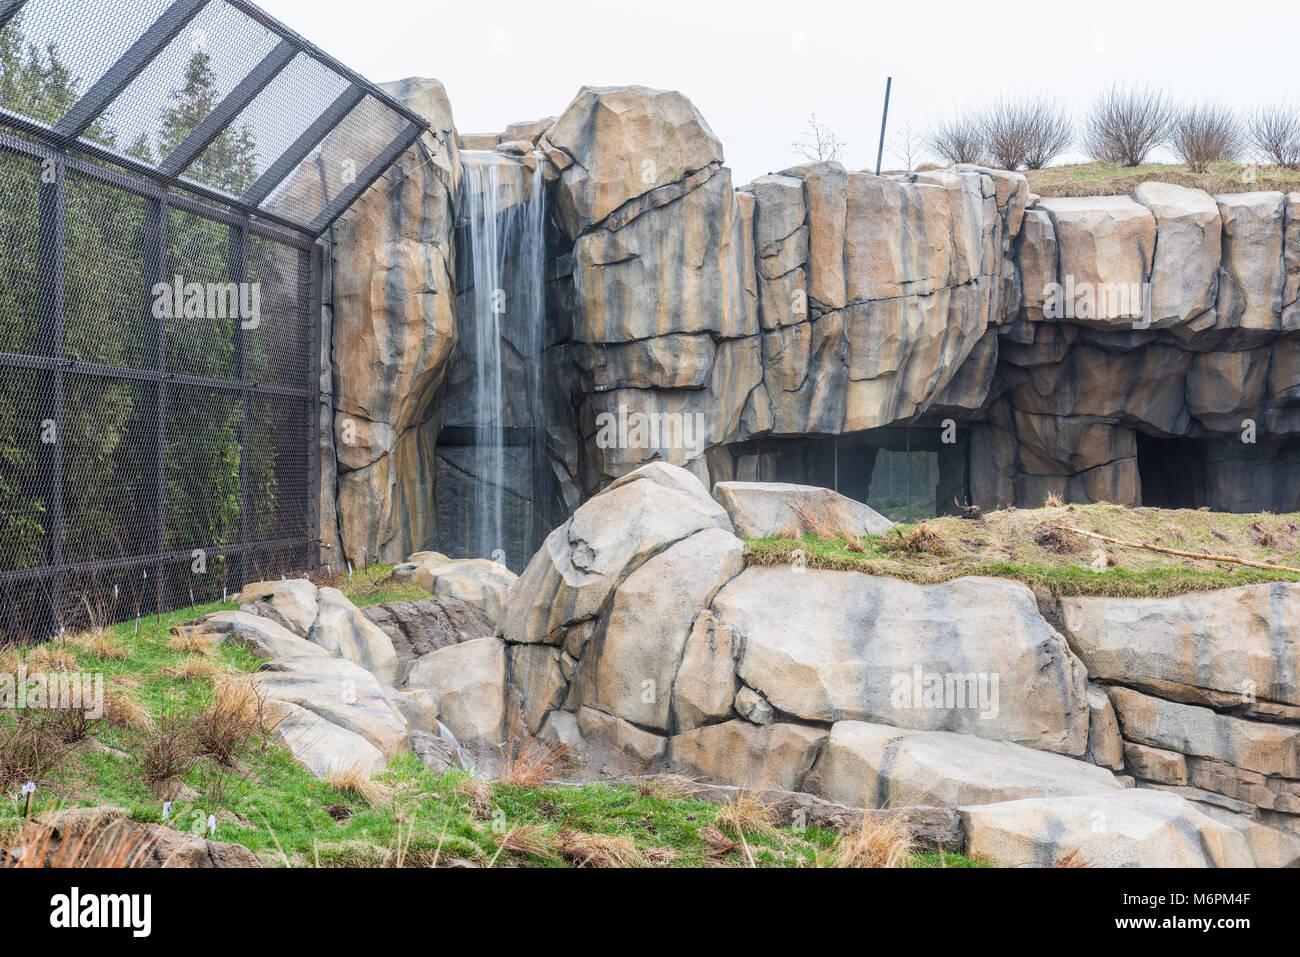 Enclosure at the Lincoln Park Zoo - Stock Image